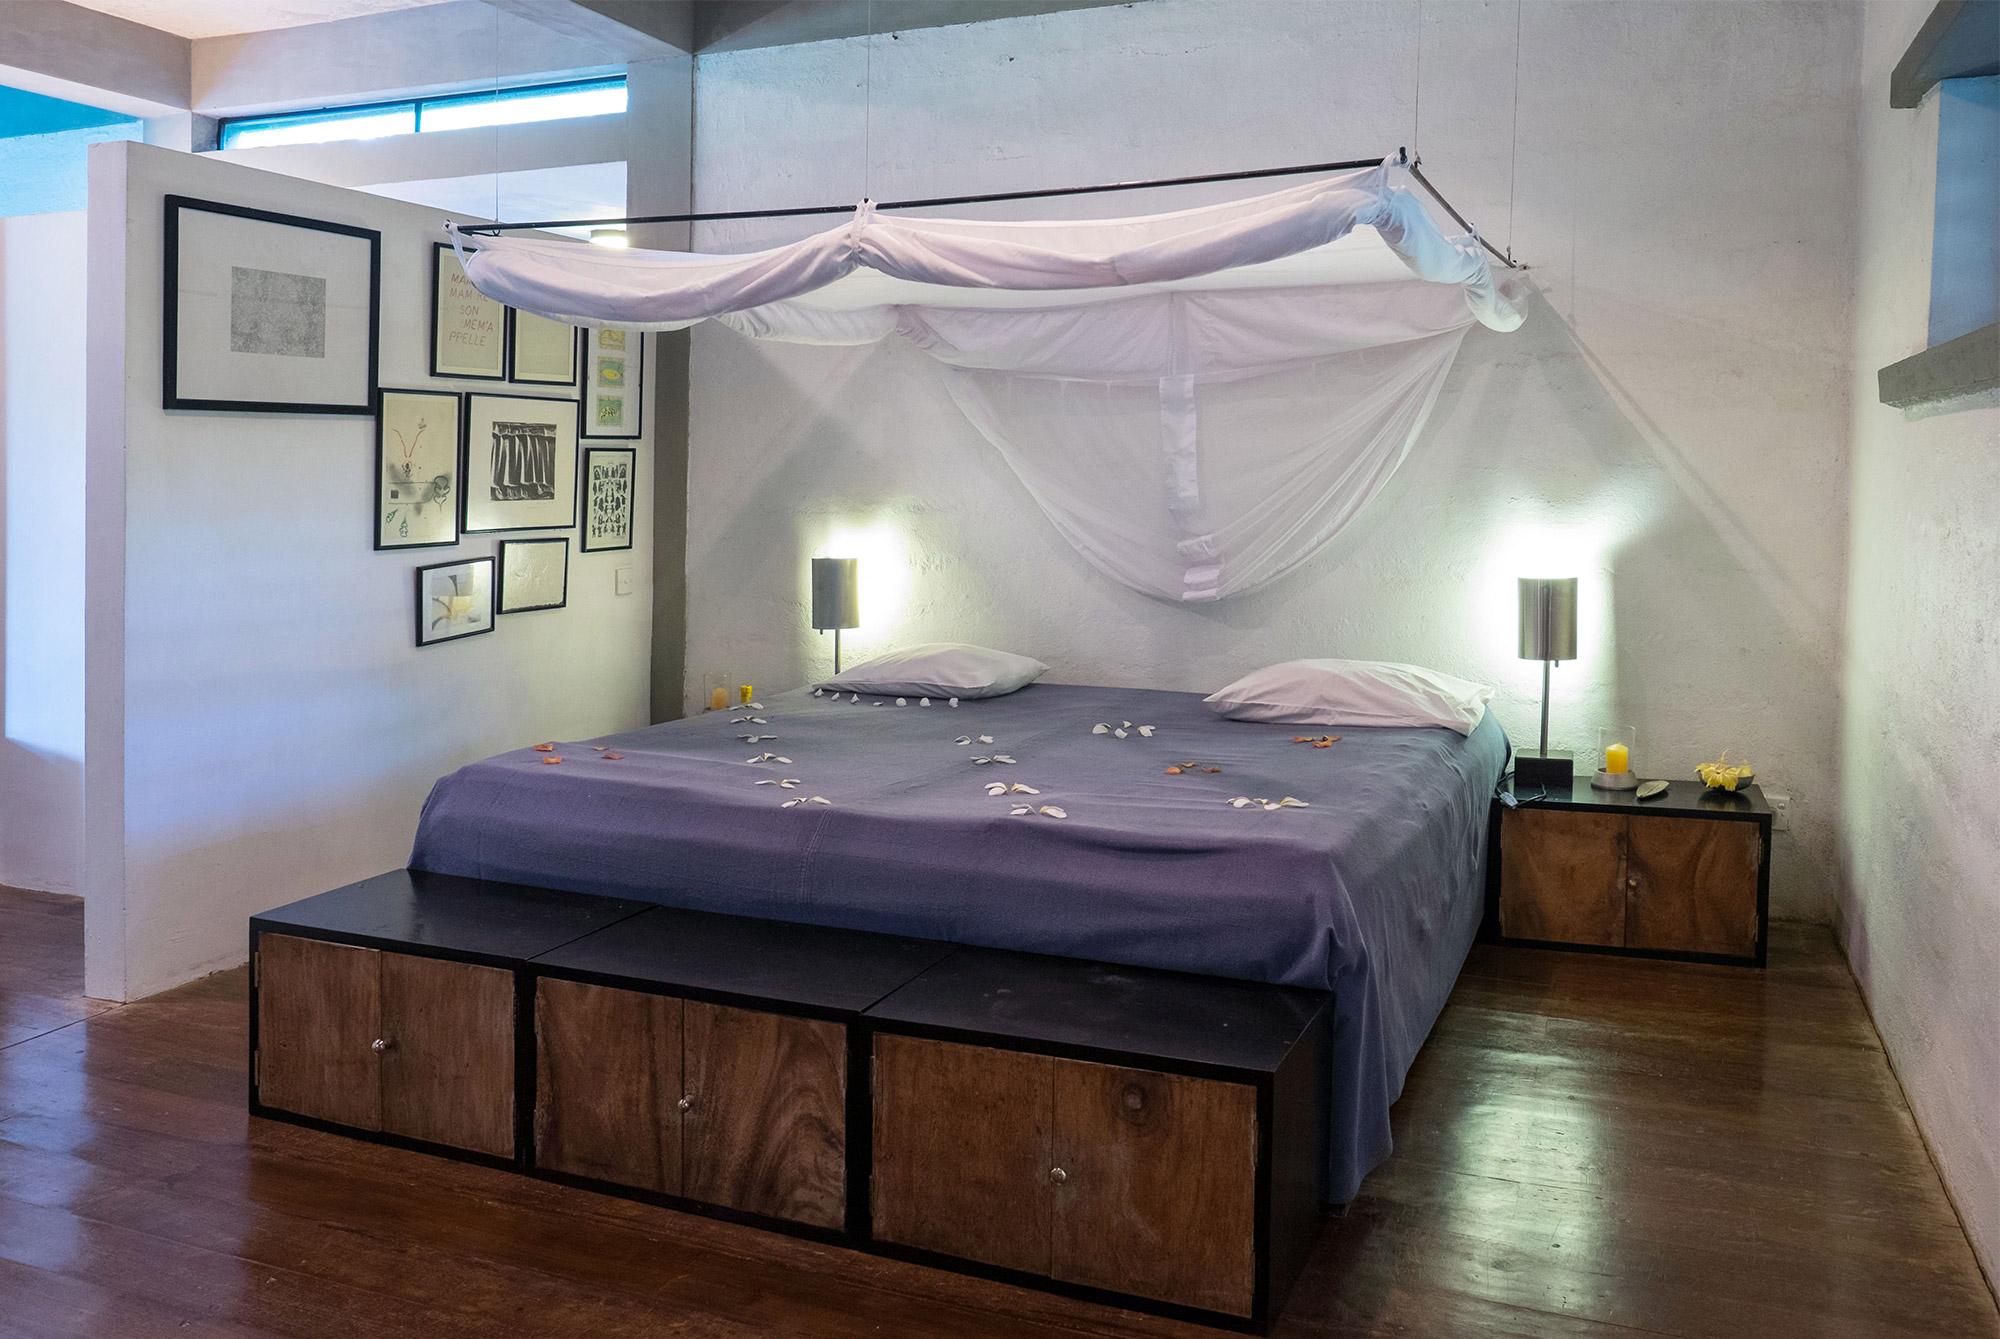 Bett im Gardenloft im Ayurveda Resort der one world foundation in Ahungalla, Sri Lanka, Foto: Andrea Alessandri